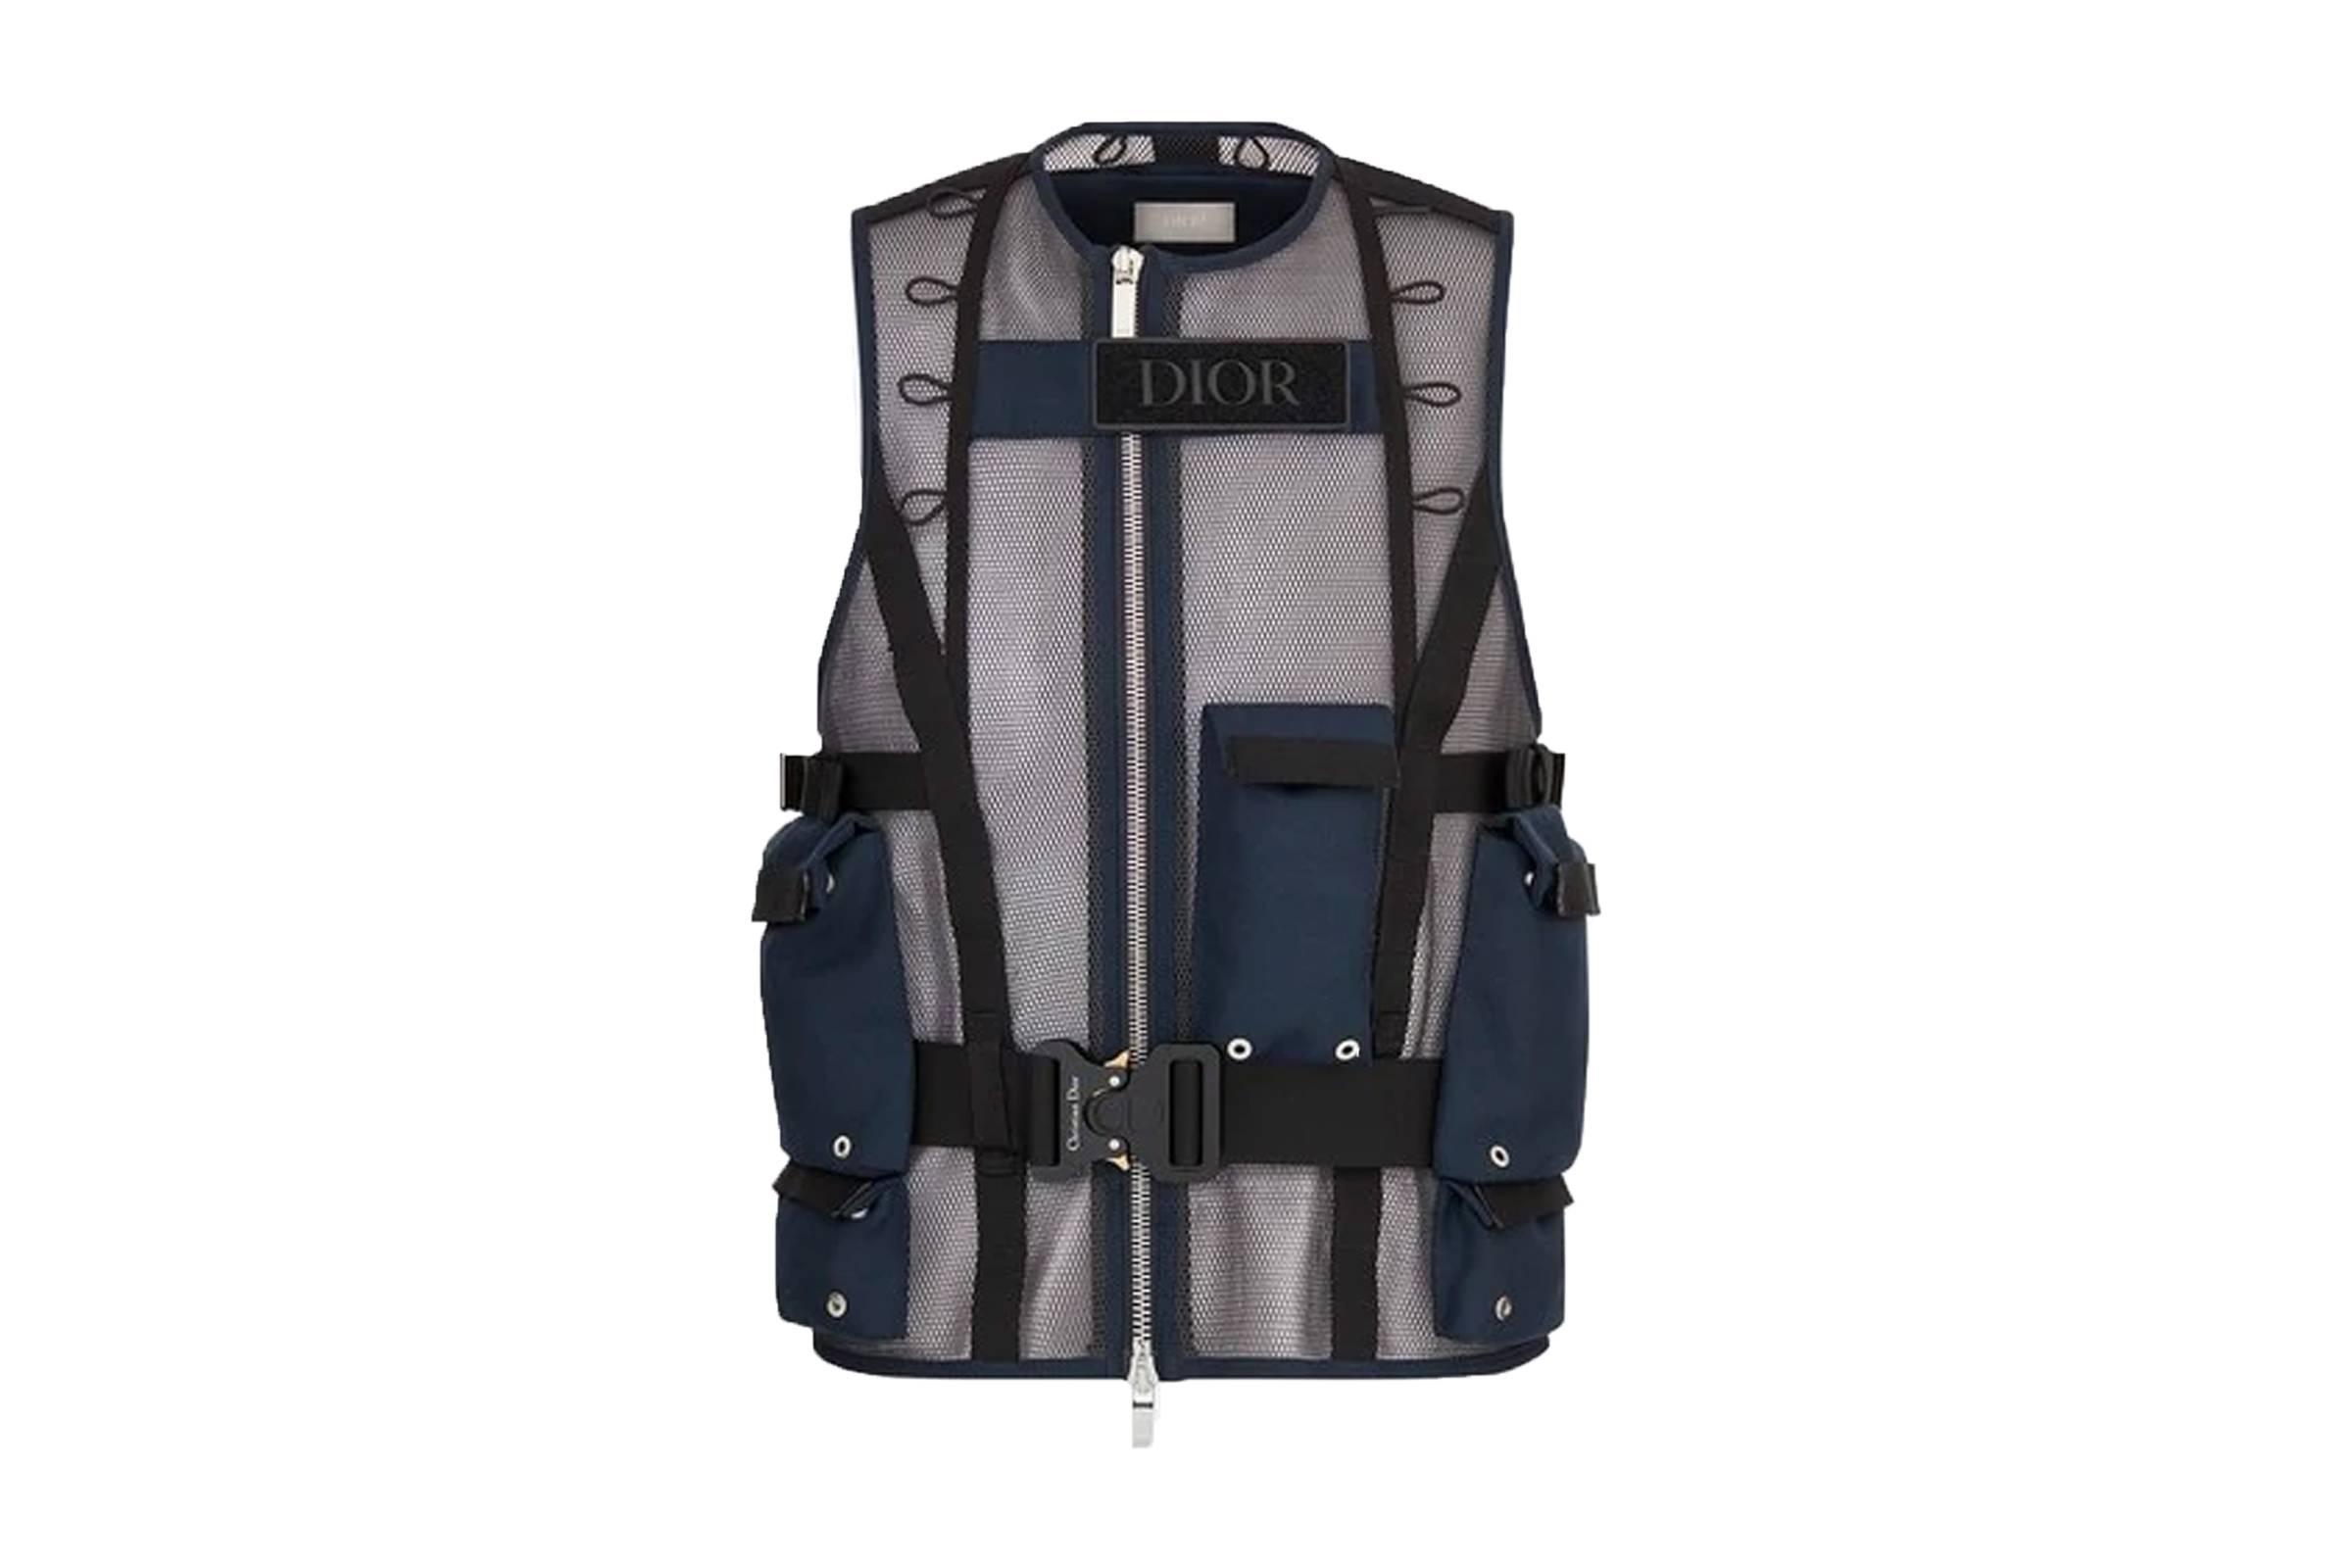 Dior Men's Technical Mesh Vest